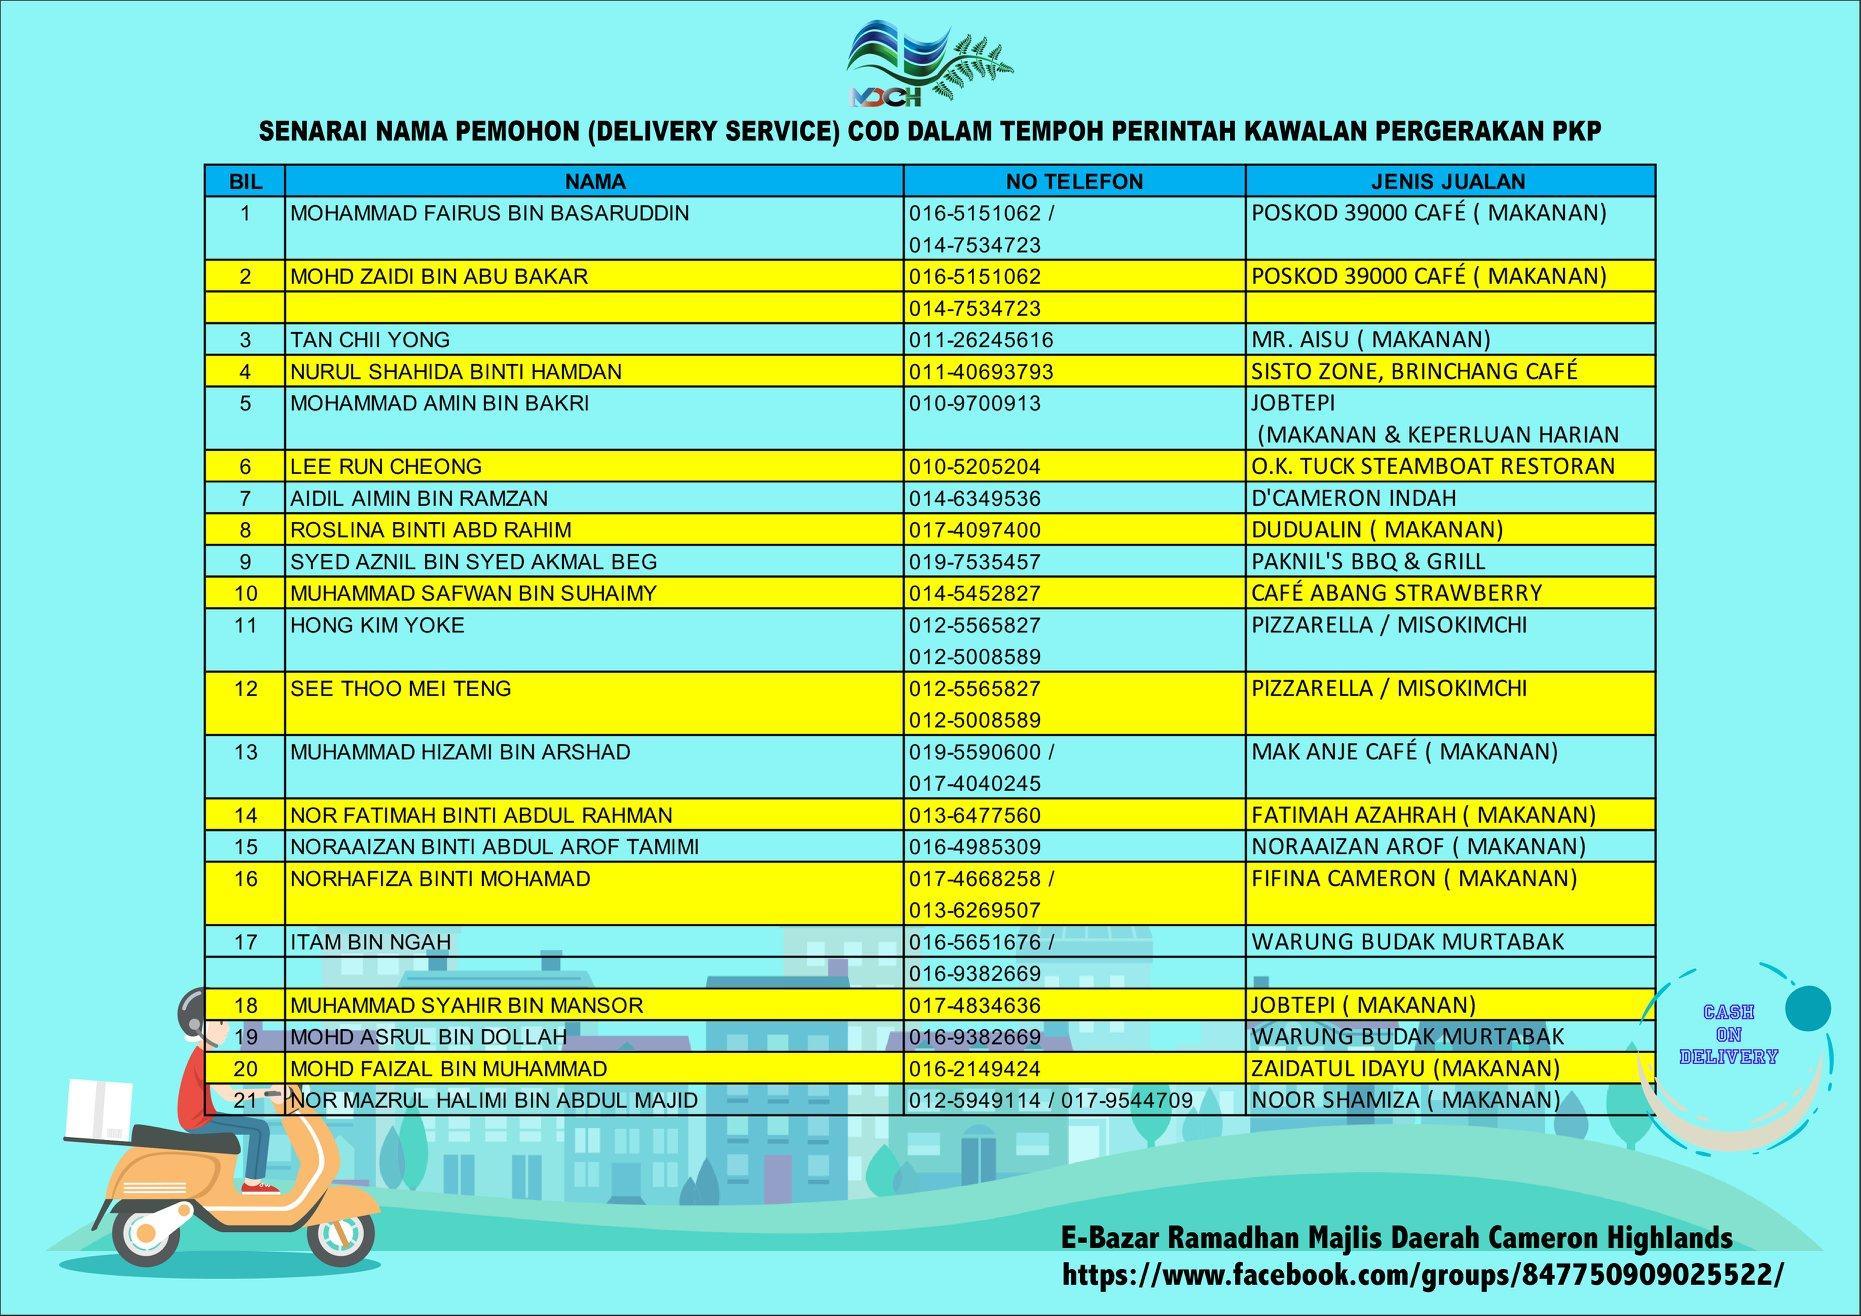 SENARAI DELIVERY SERVICE (COD) DALAM TEMPOH PERINTAH KAWALAN PERGERAKAN (PKP)